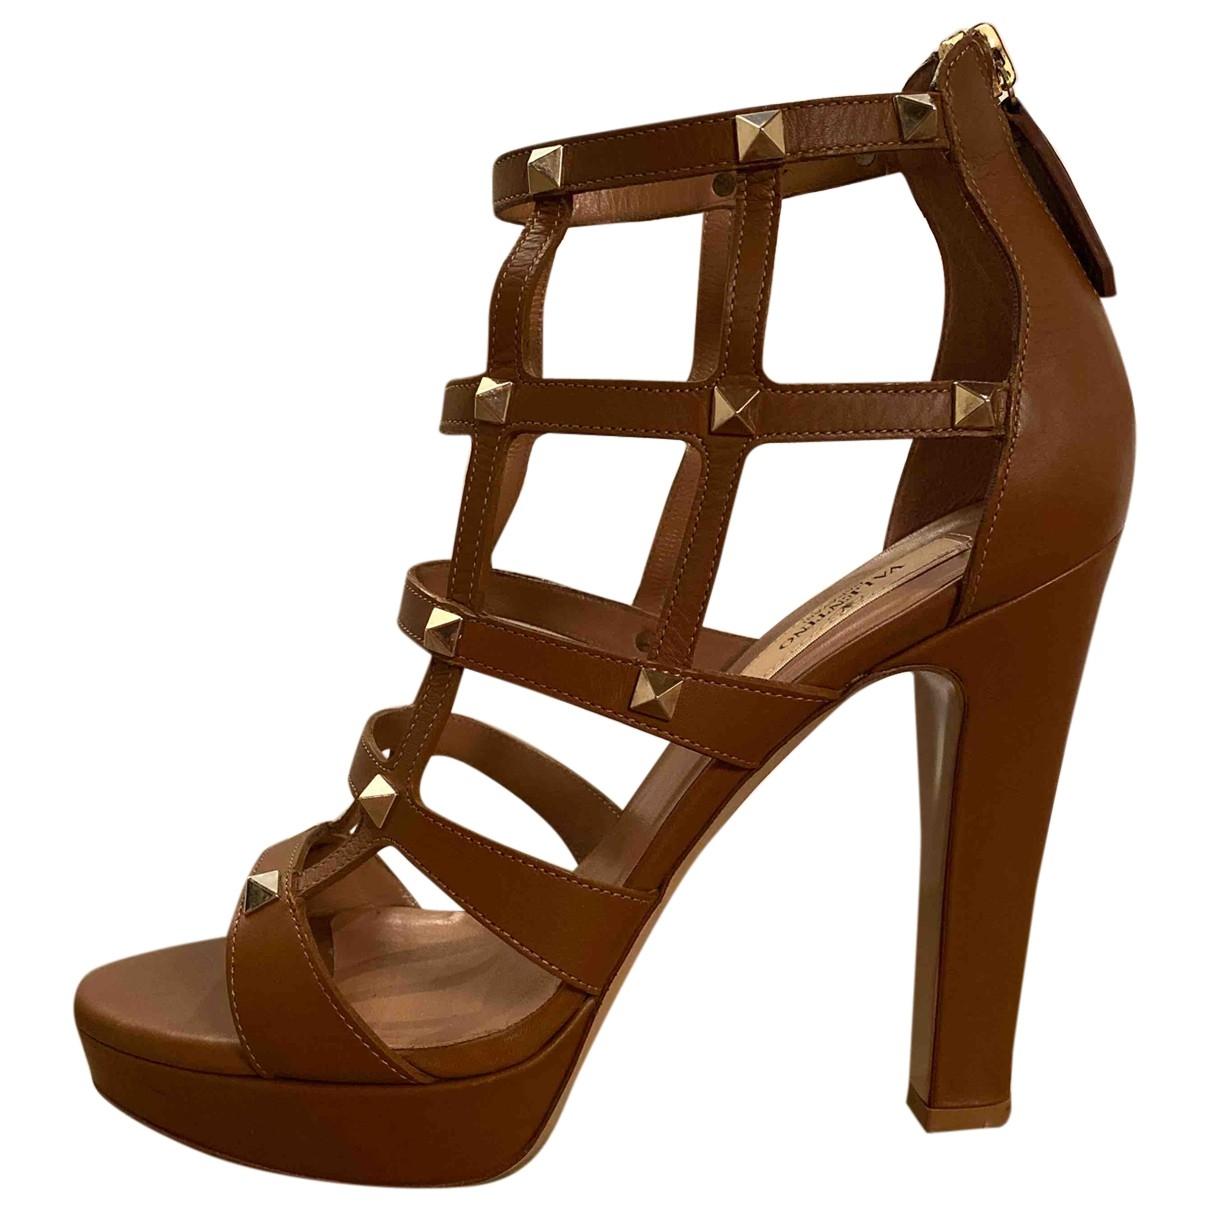 Valentino Garavani \N Camel Leather Sandals for Women 38.5 EU